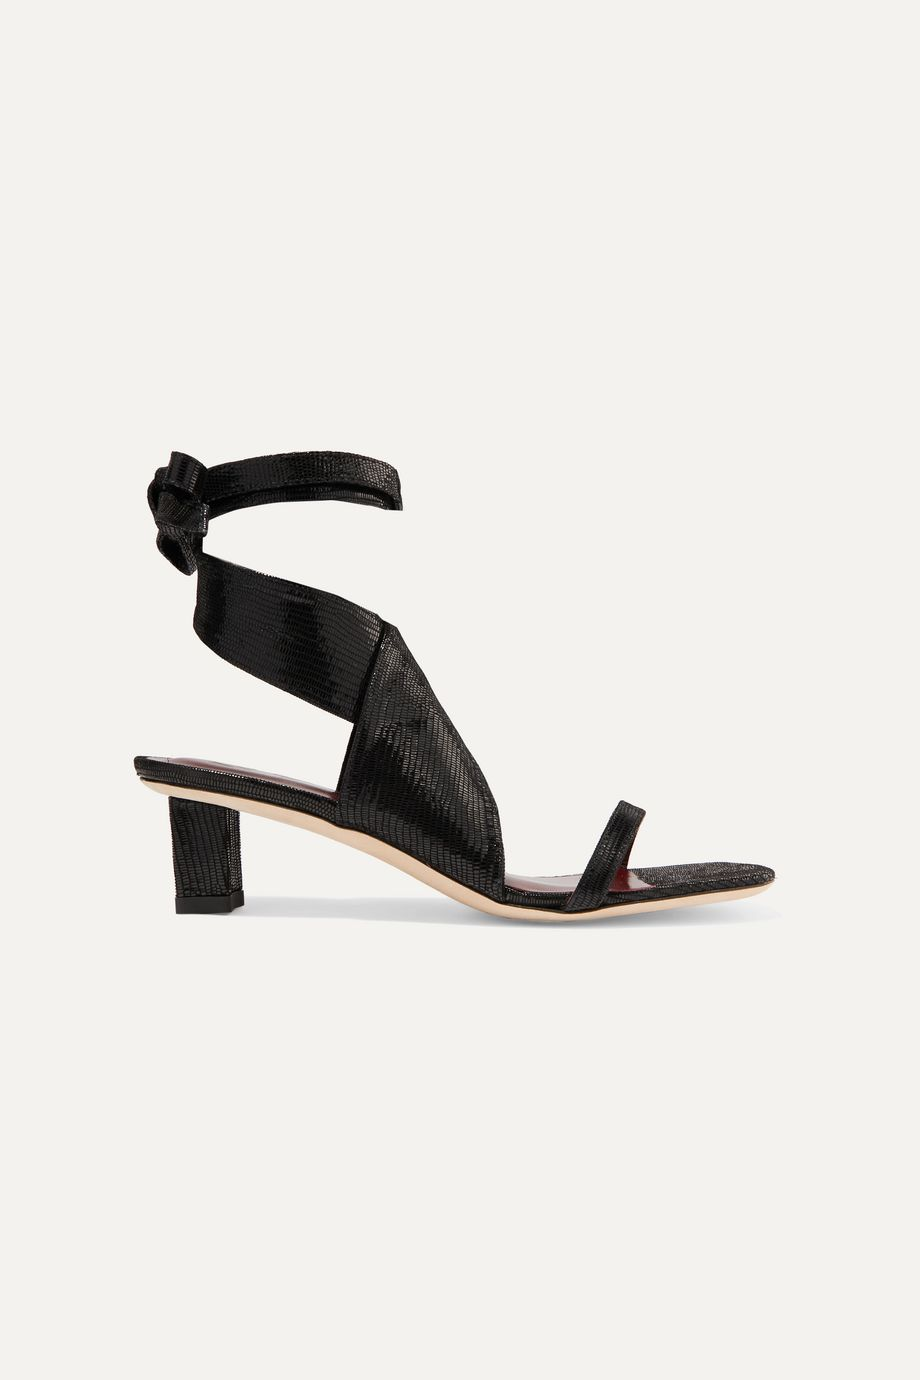 STAUD Rui lizard-effect leather sandals